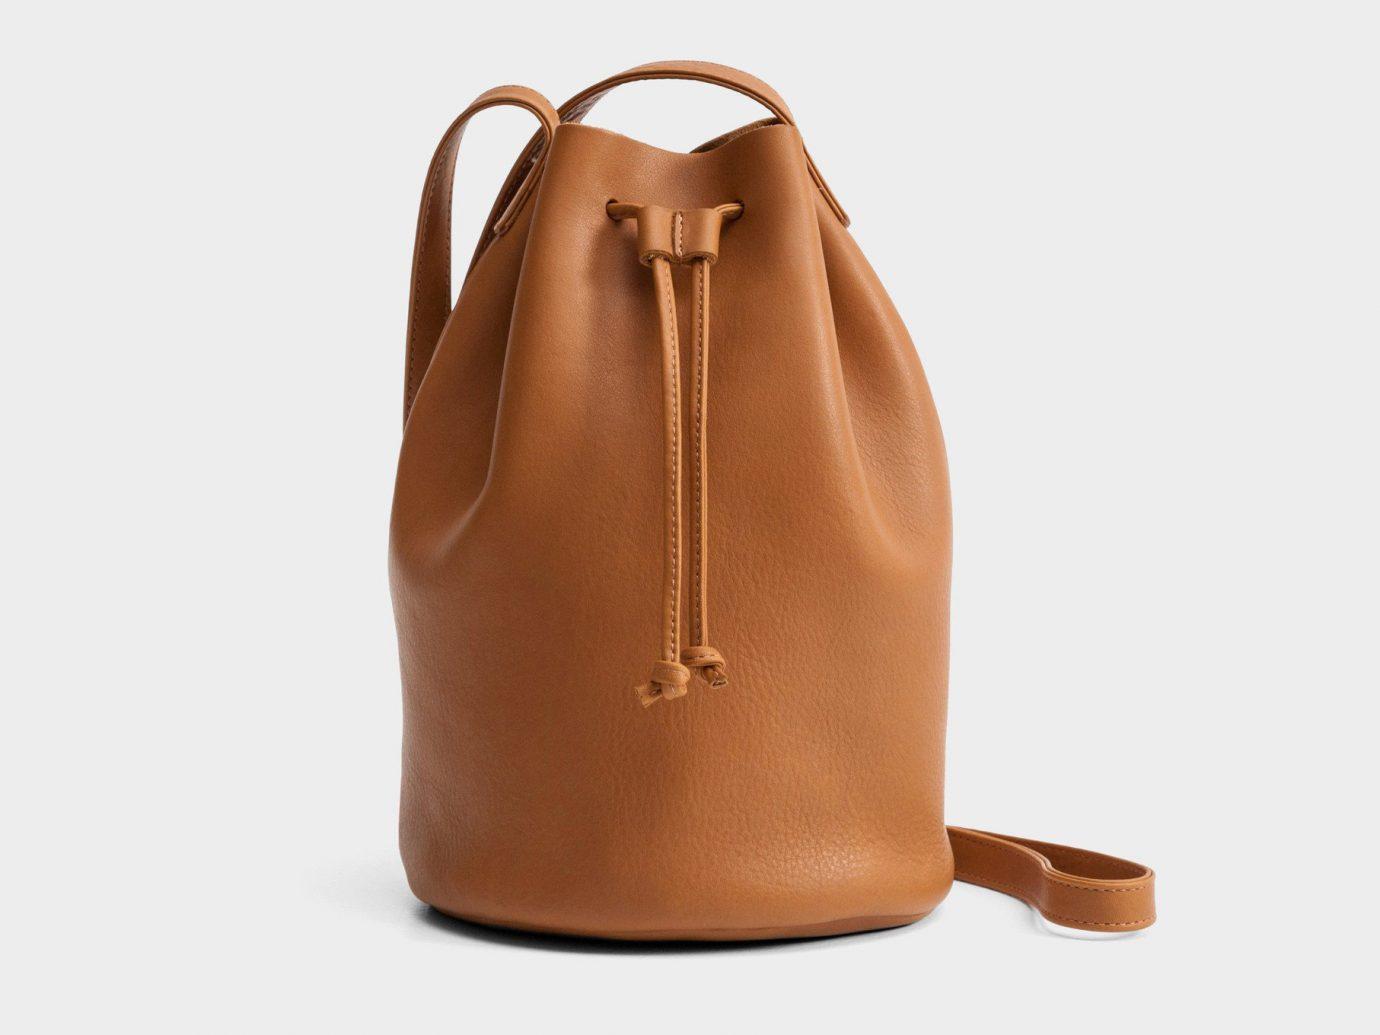 Girls Getaways Trip Ideas Weekend Getaways bag brown leather product handbag caramel color shoulder bag accessory product design tan